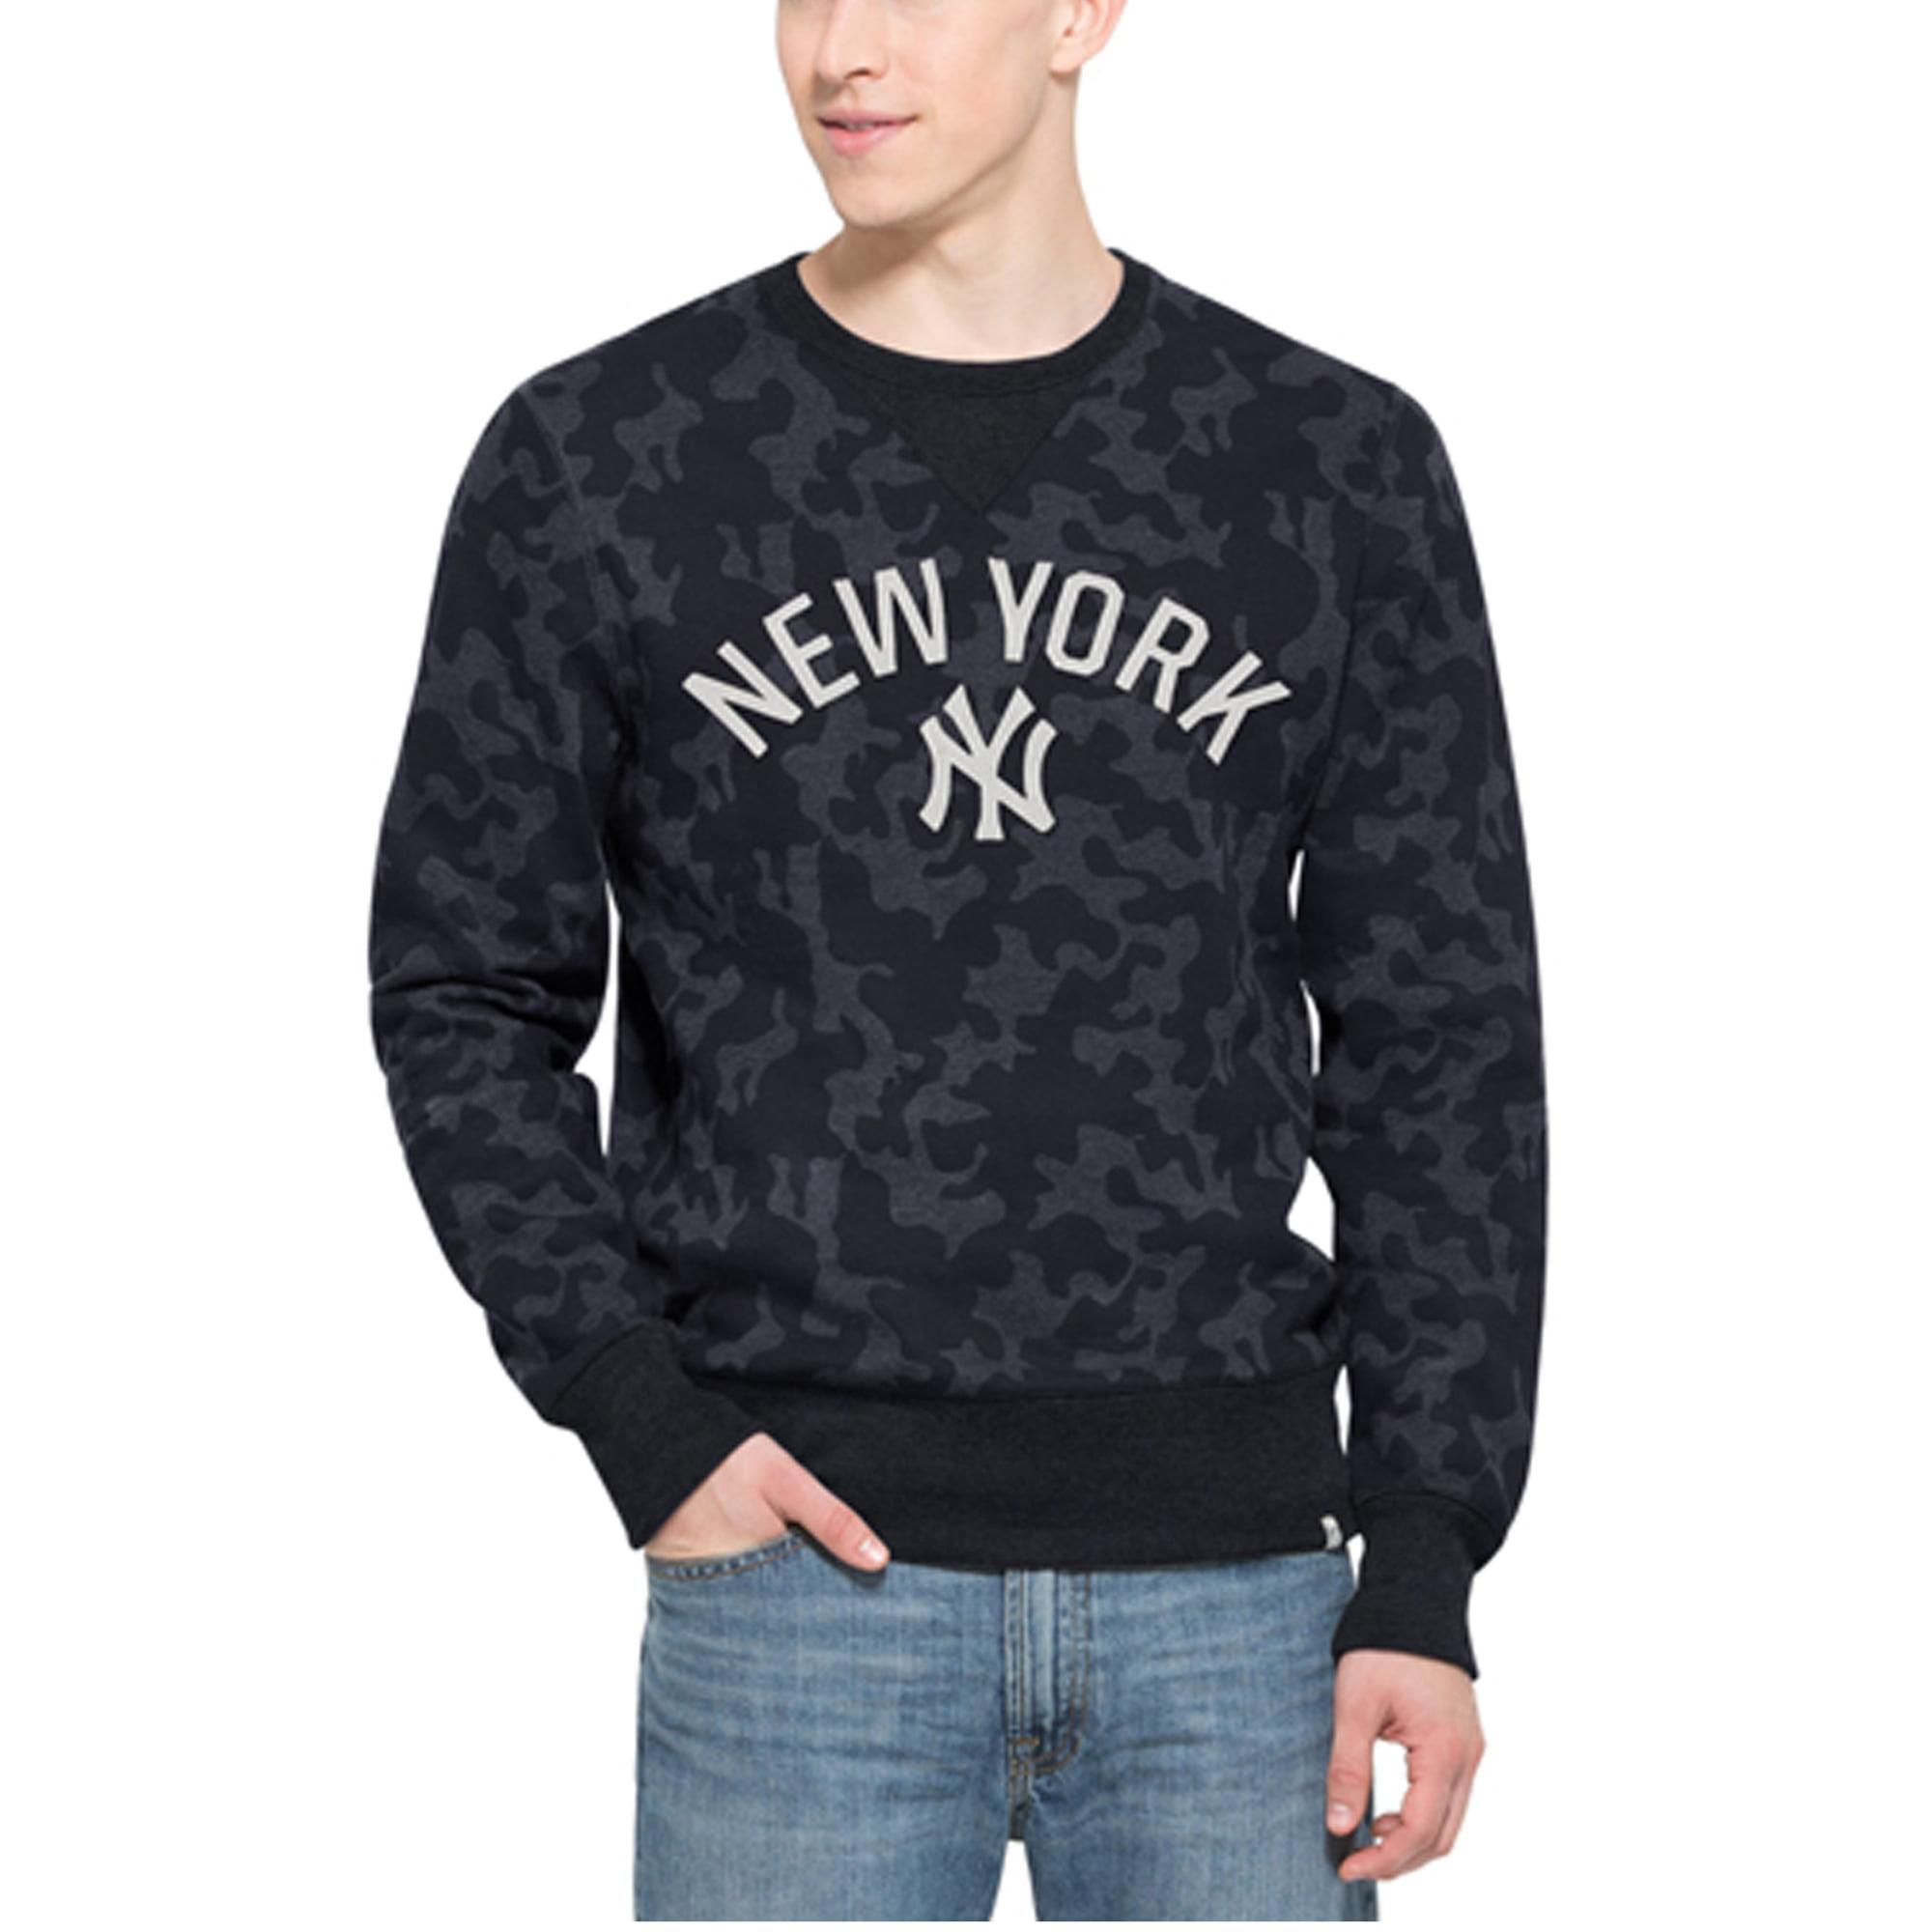 New York Yankees '47 Brand Stealth Camo Crew Sweatshirt - Navy